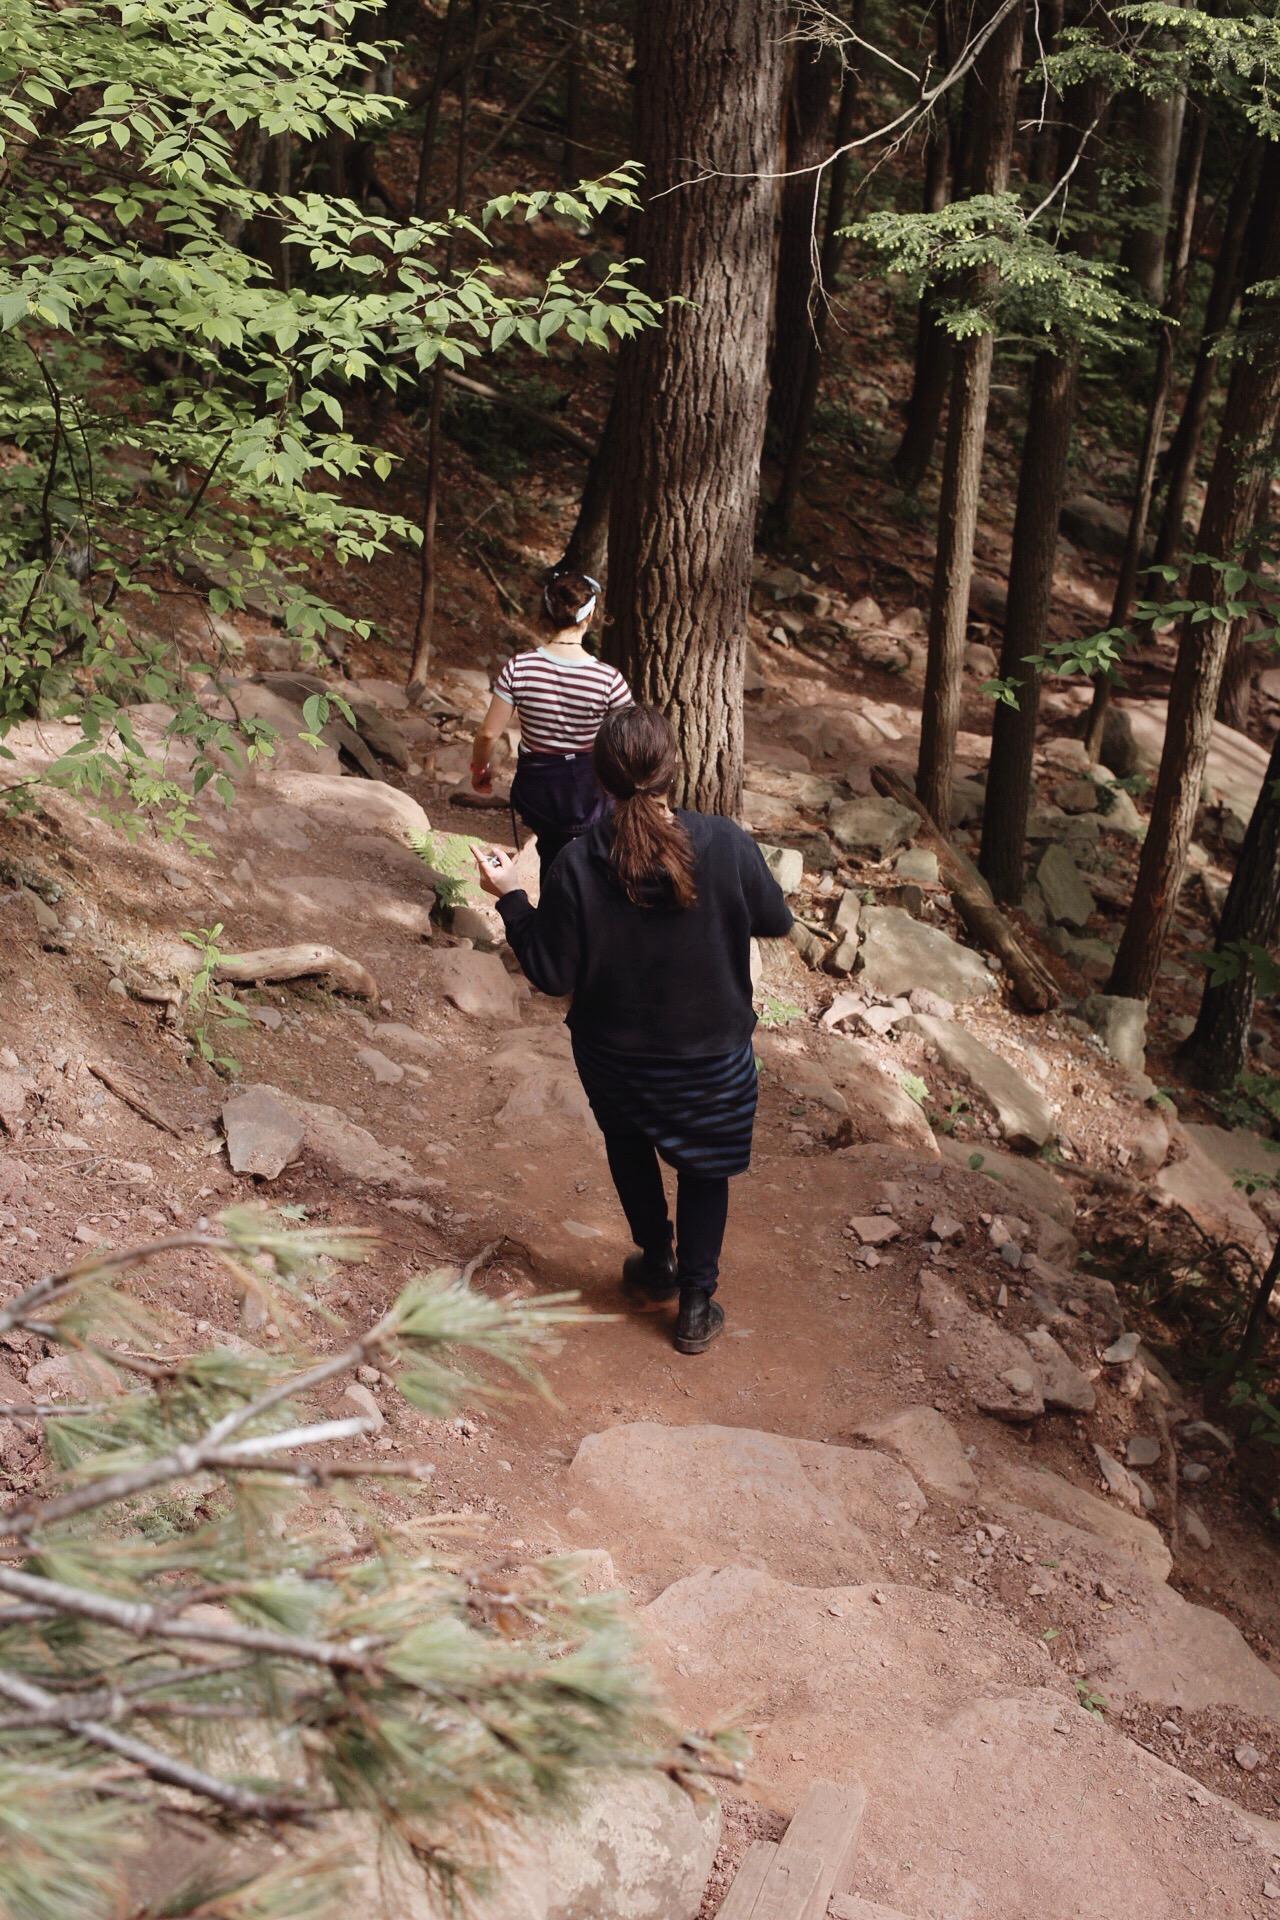 thais-and-sarah-hiking-to-a-waterfall.jpg